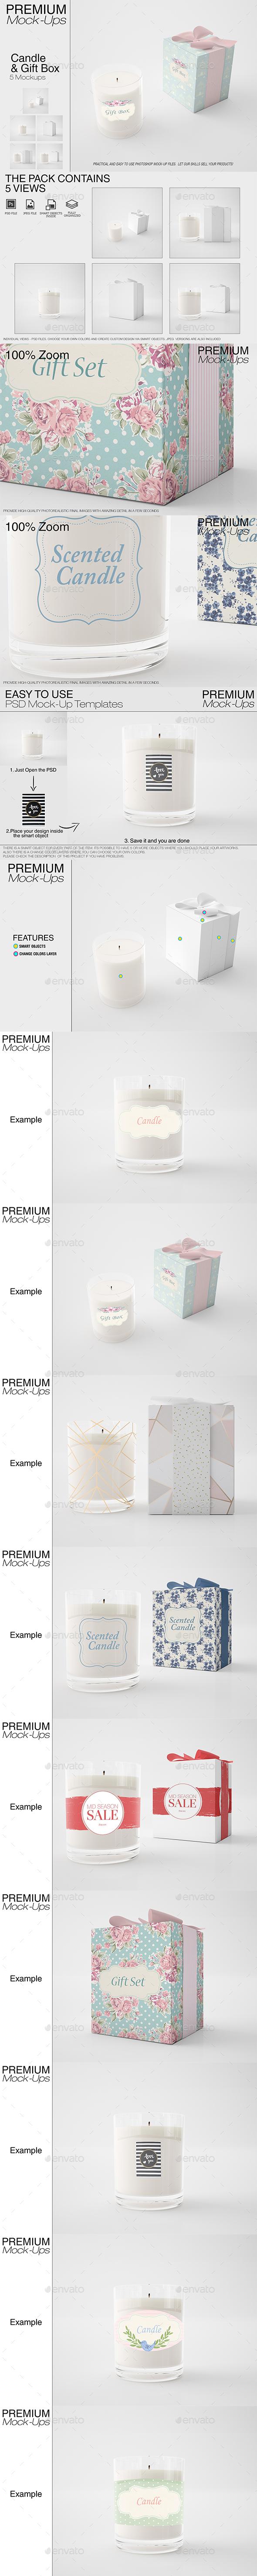 Candle & Gift Box Set - Print Product Mock-Ups